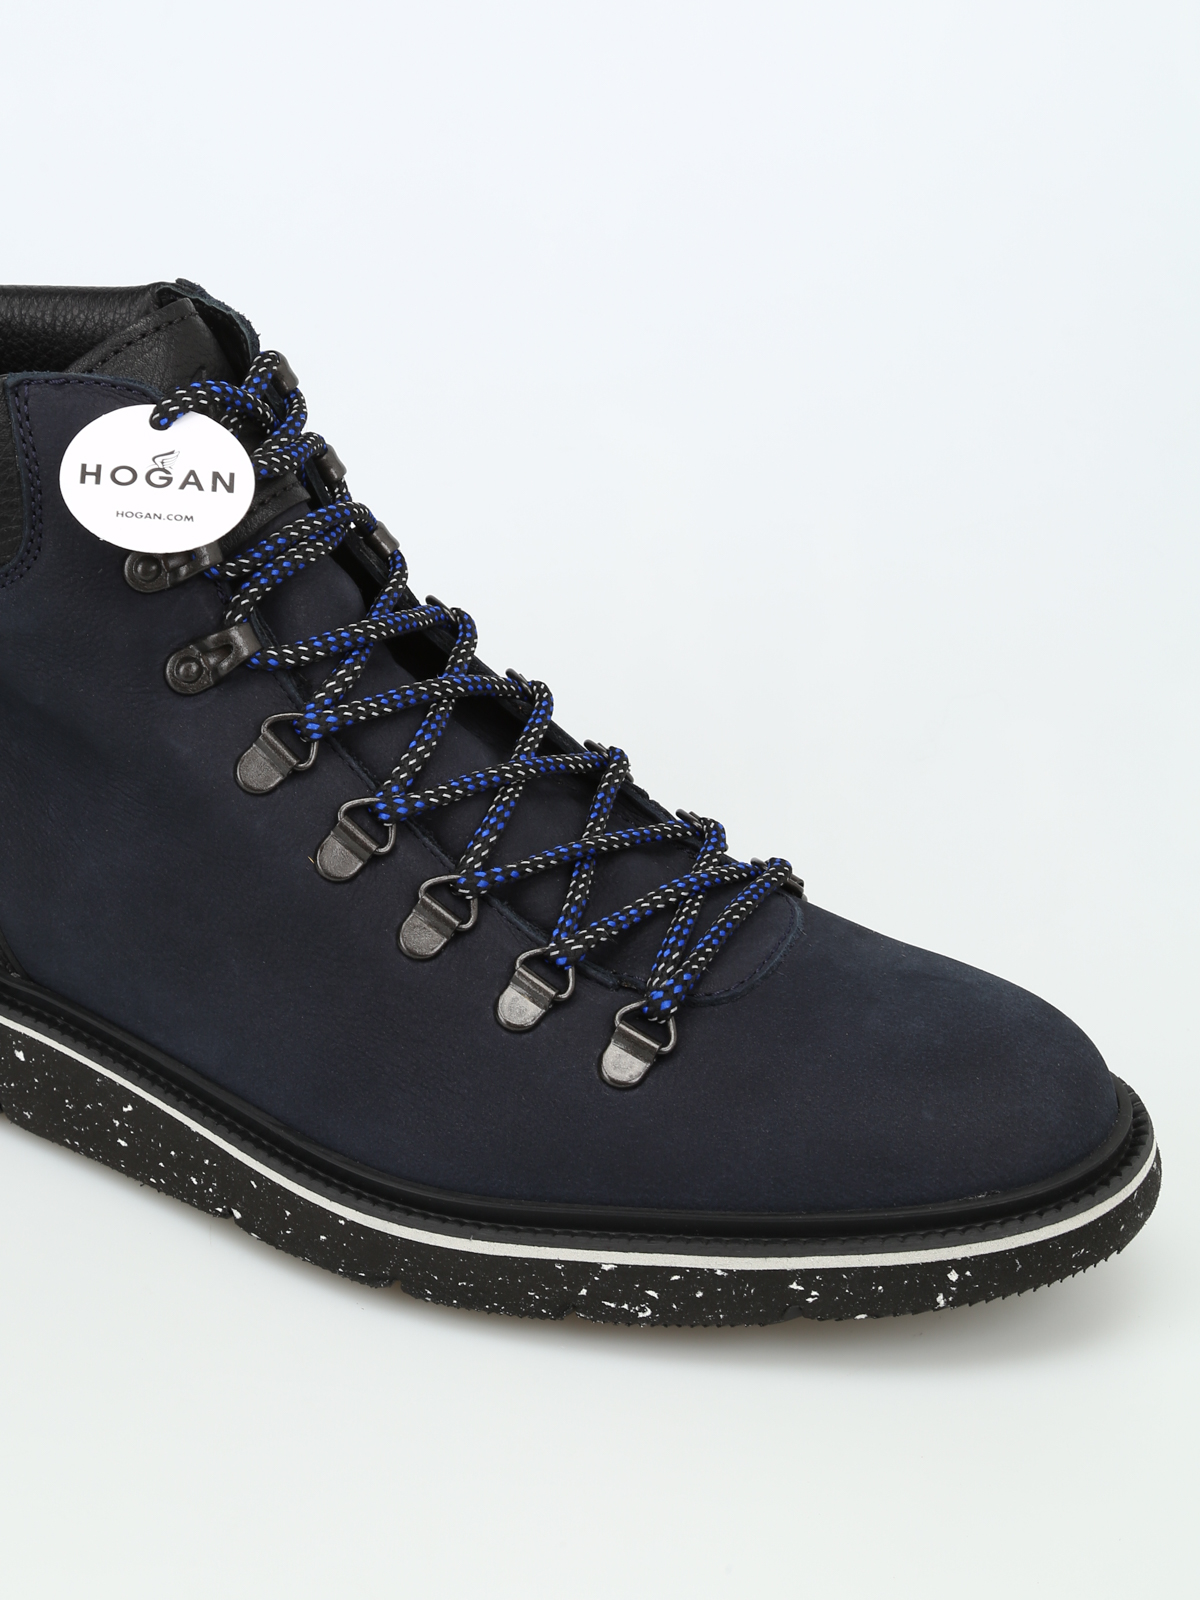 Hogan - H334 dark blue nubuck hiking boots - ankle boots ...